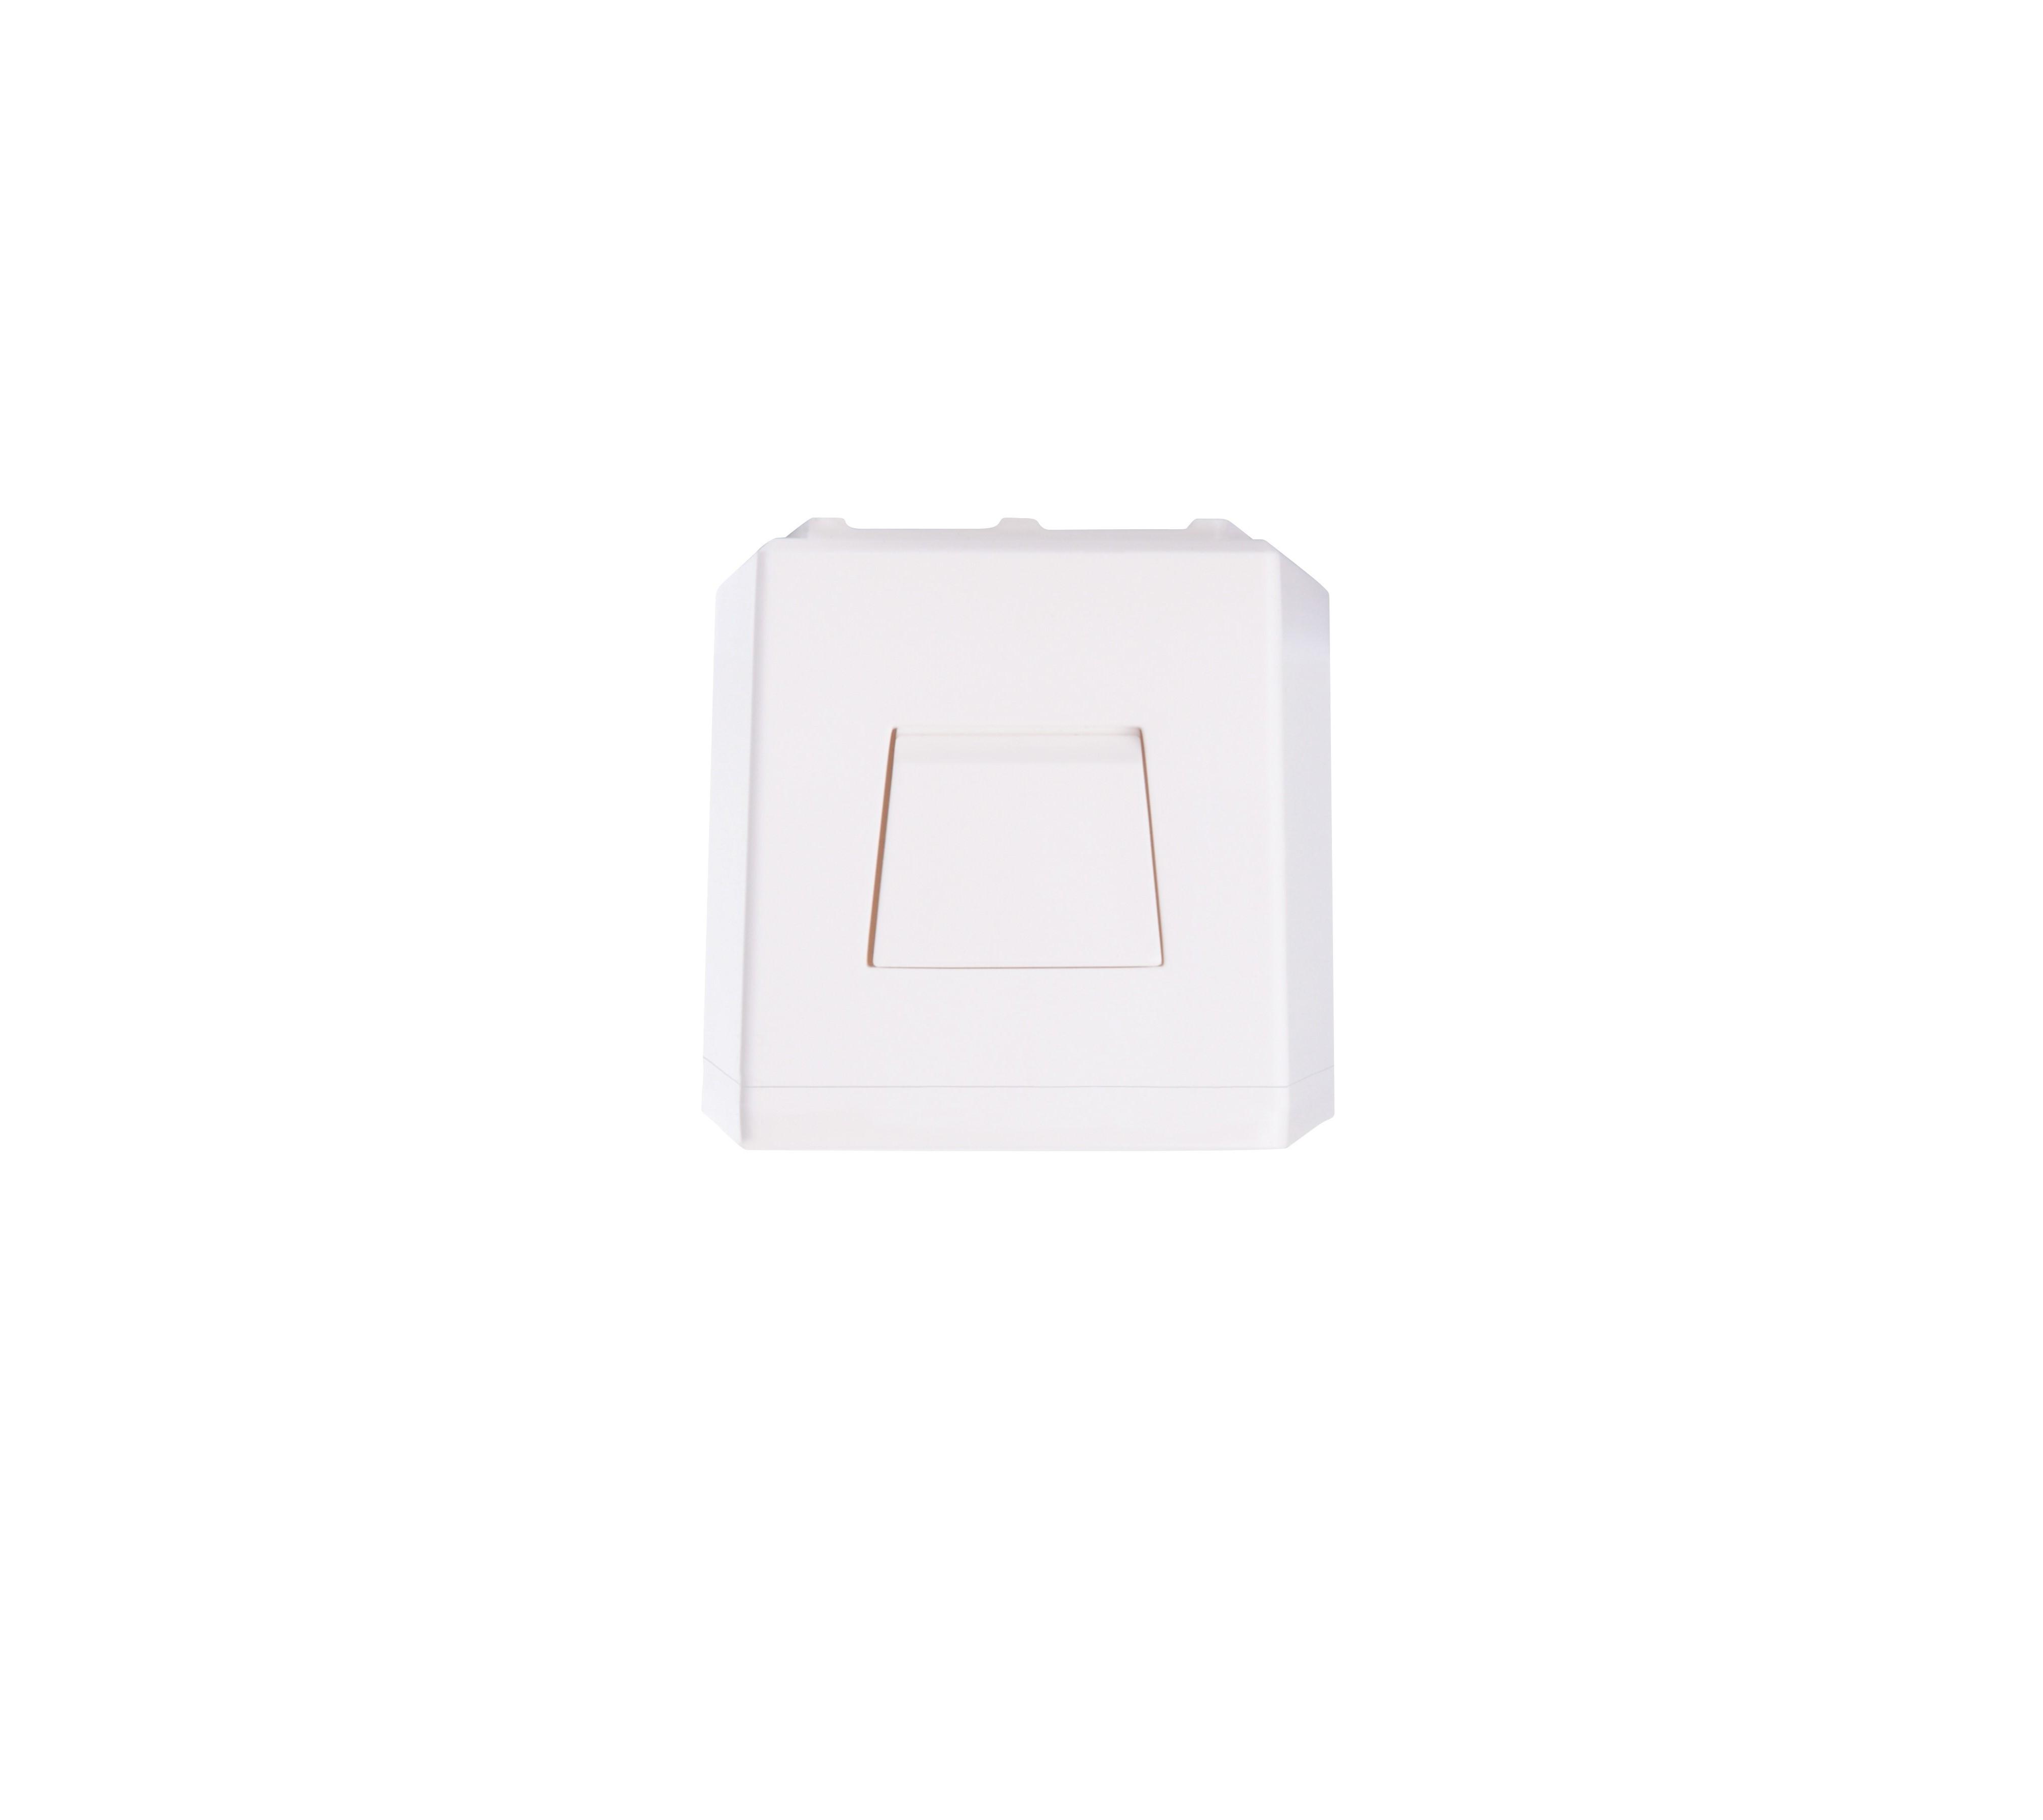 Lampa antipanica led Intelight 94771   2h nementinut test automat 1